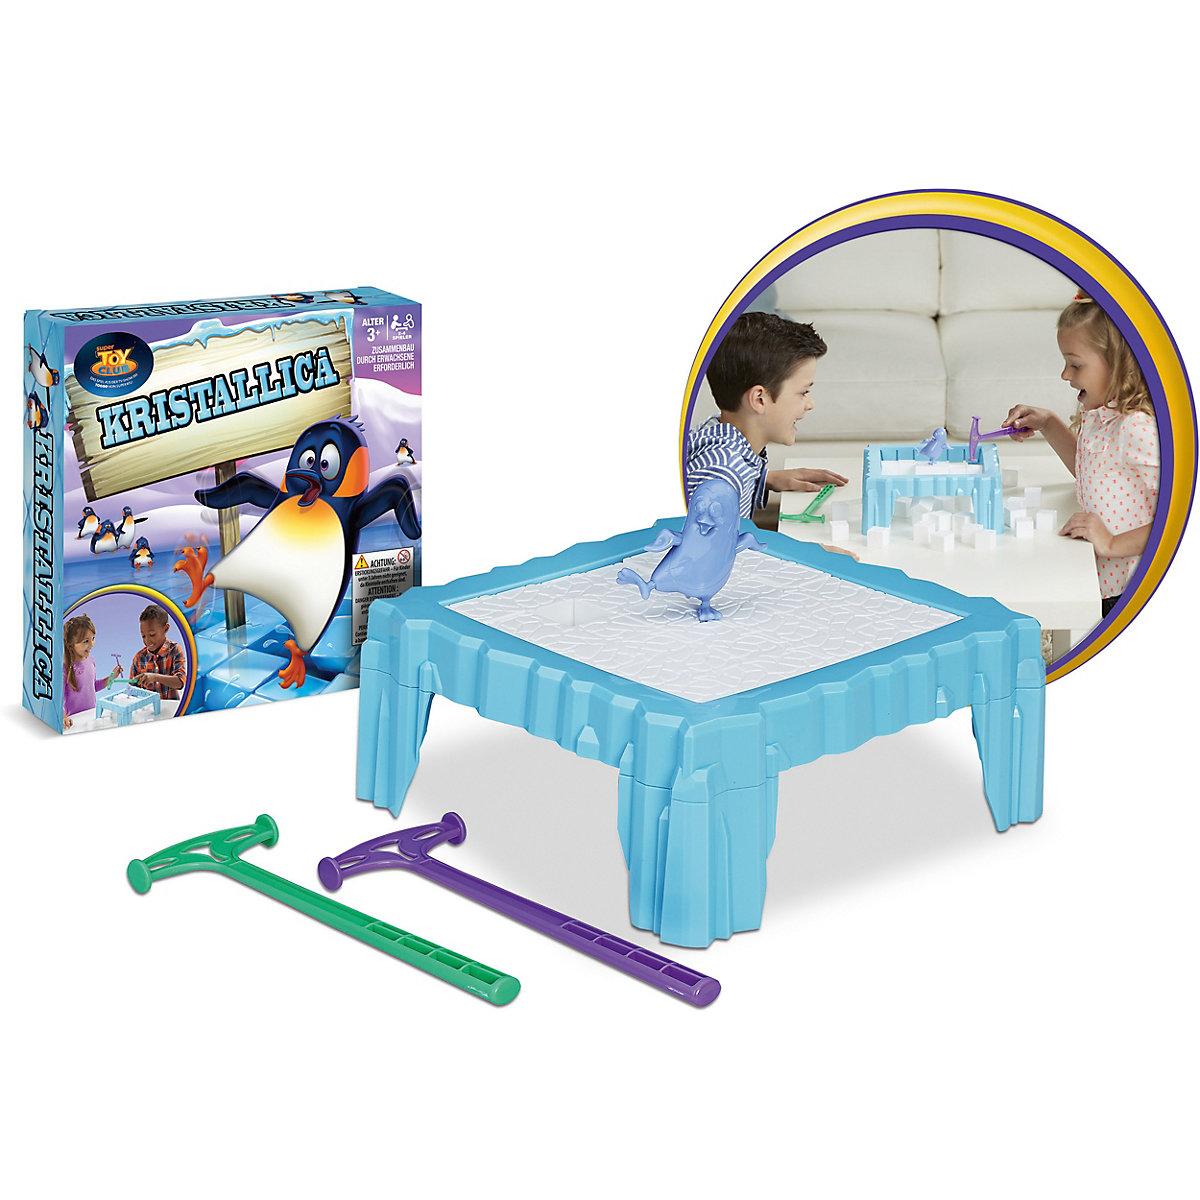 Kristallica Spiel Hasbro